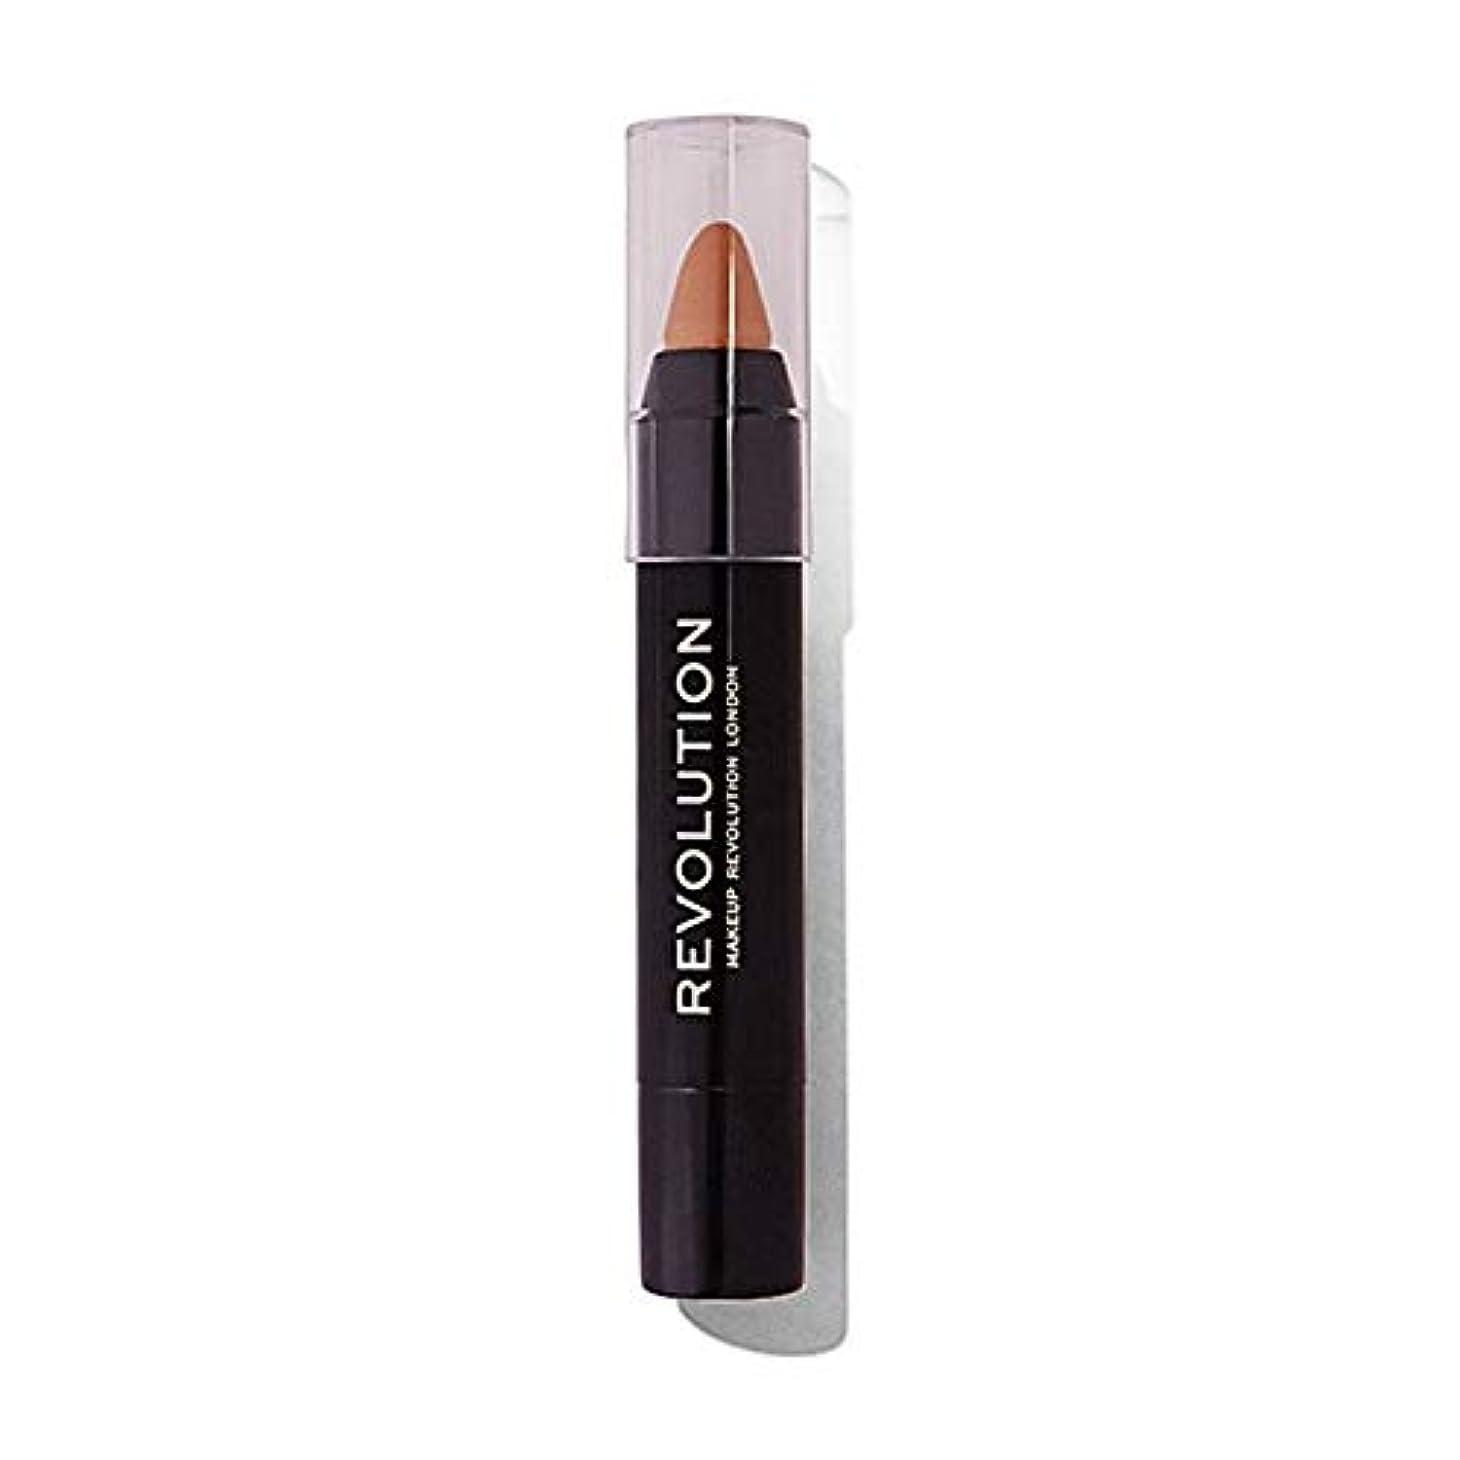 [Hair Revolution ] 化粧革命のルートスティック金髪をカバー - Makeup Revolution Root Cover Up Stick Blonde [並行輸入品]